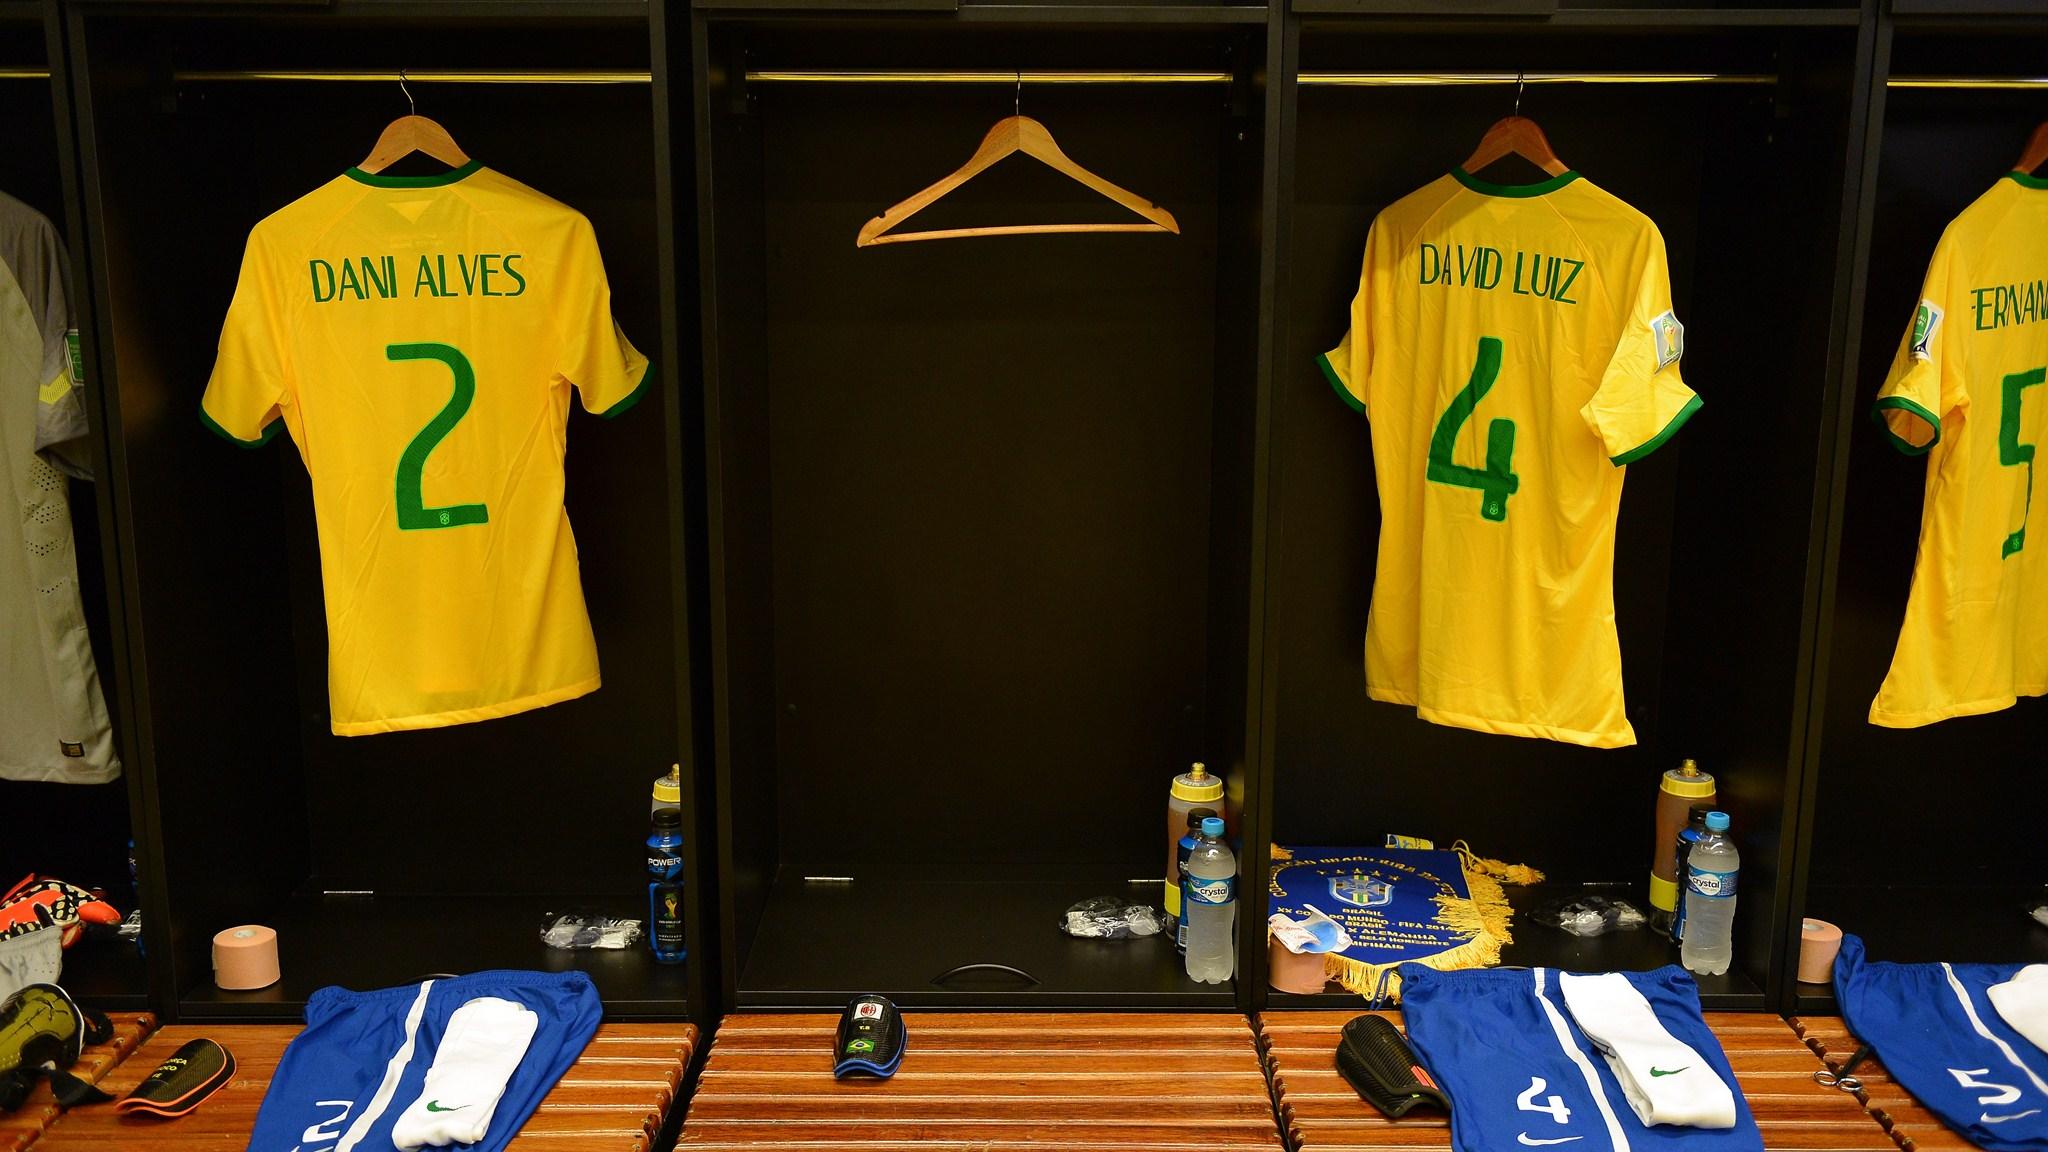 216 - Brazil-Germany [1-7] -- 08 Jul 2014 - 17-00 - kuaza